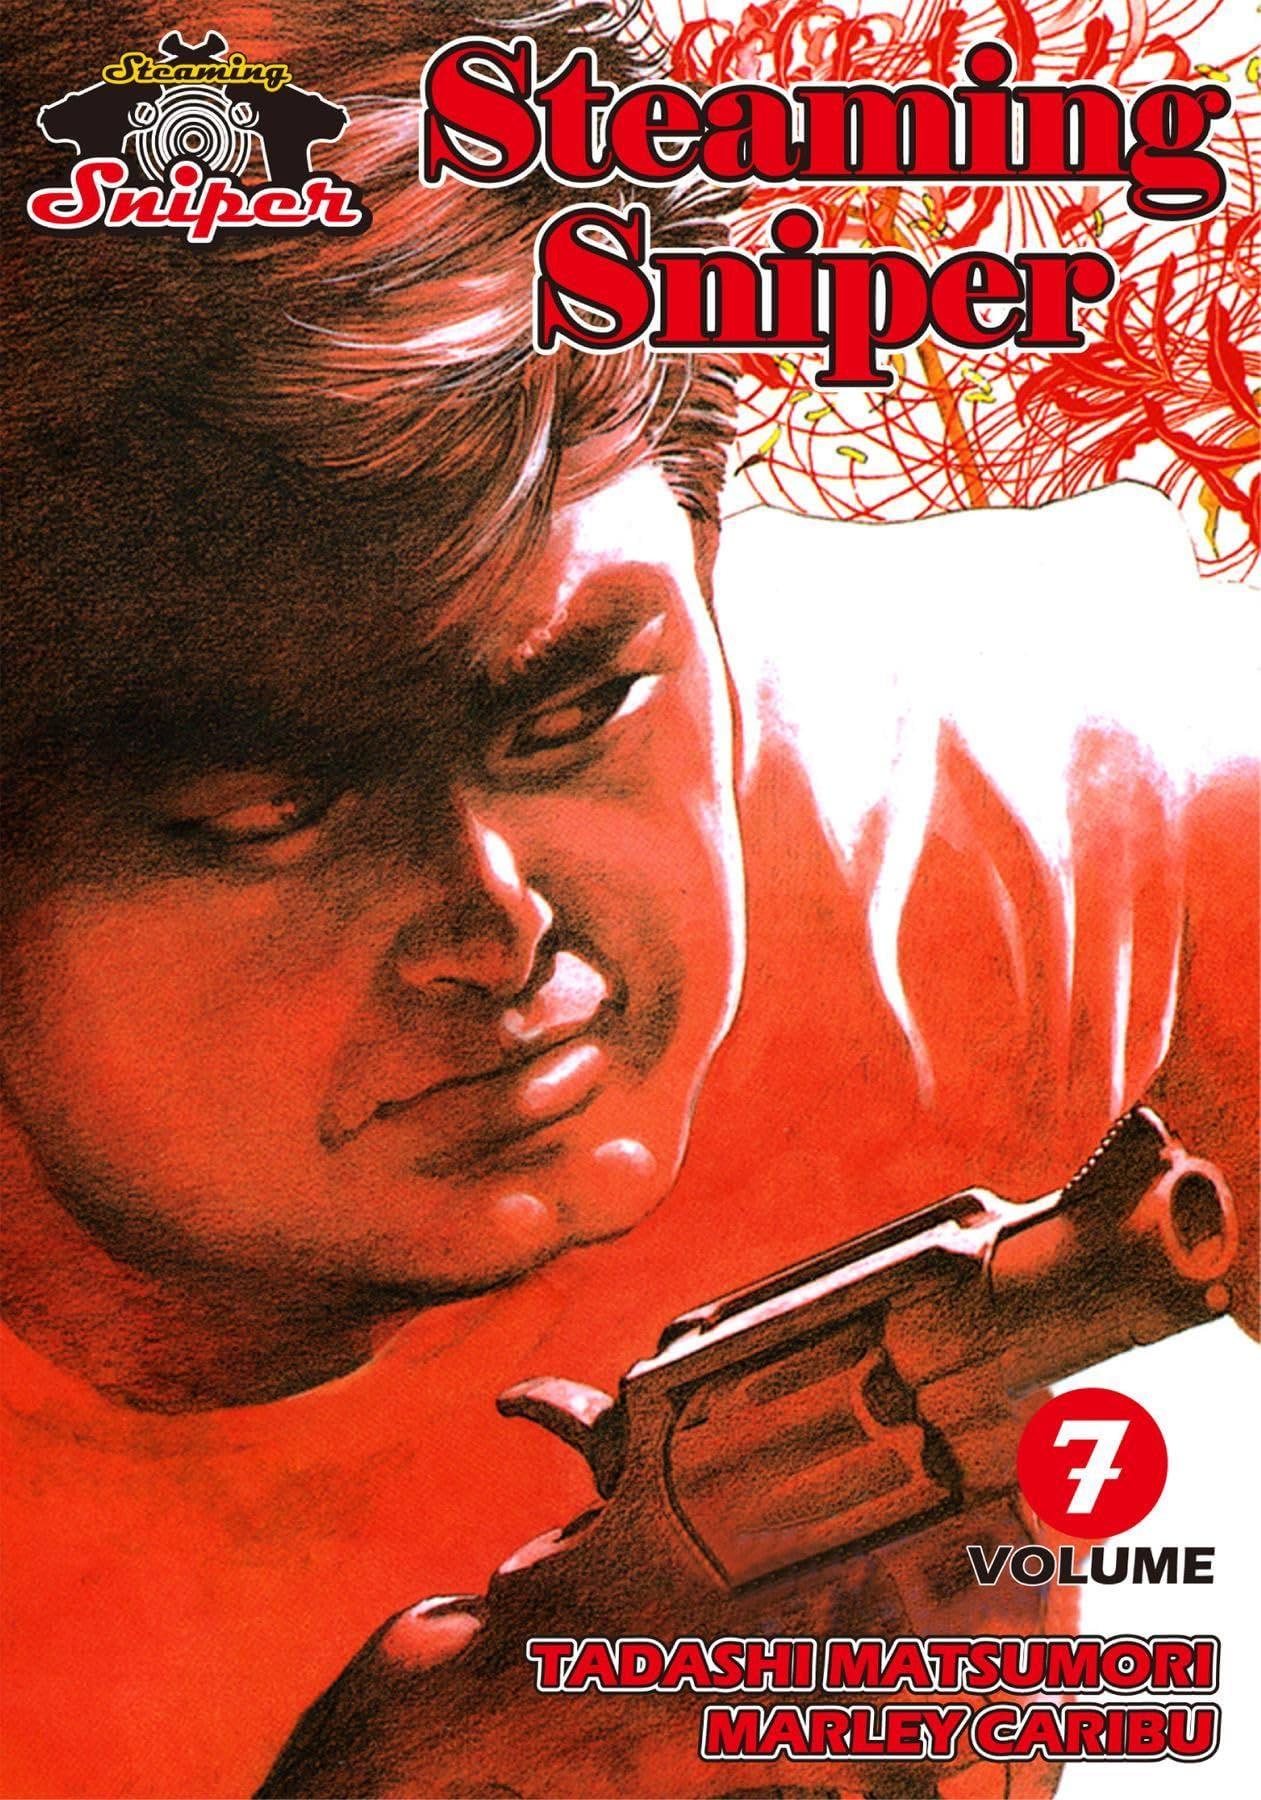 STEAMING SNIPER Vol. 7